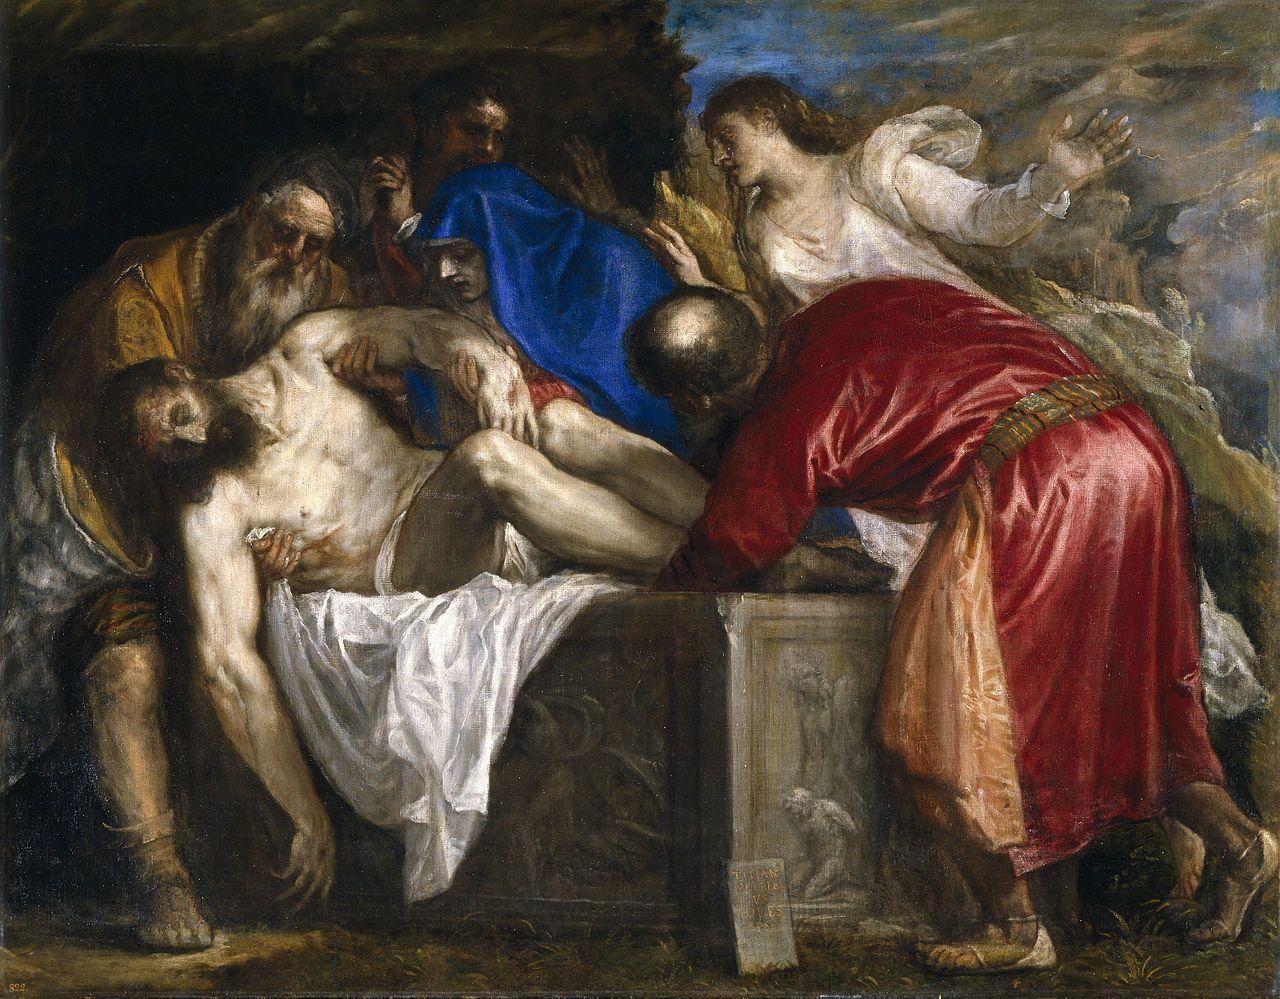 Titian (Tiziano Vecellio), c.1485/90?–1576, Italian, Entombment, 1559. Oil  on canvas, 137 x 175 cm. Museo del Prado, Madrid. High Renaissance.